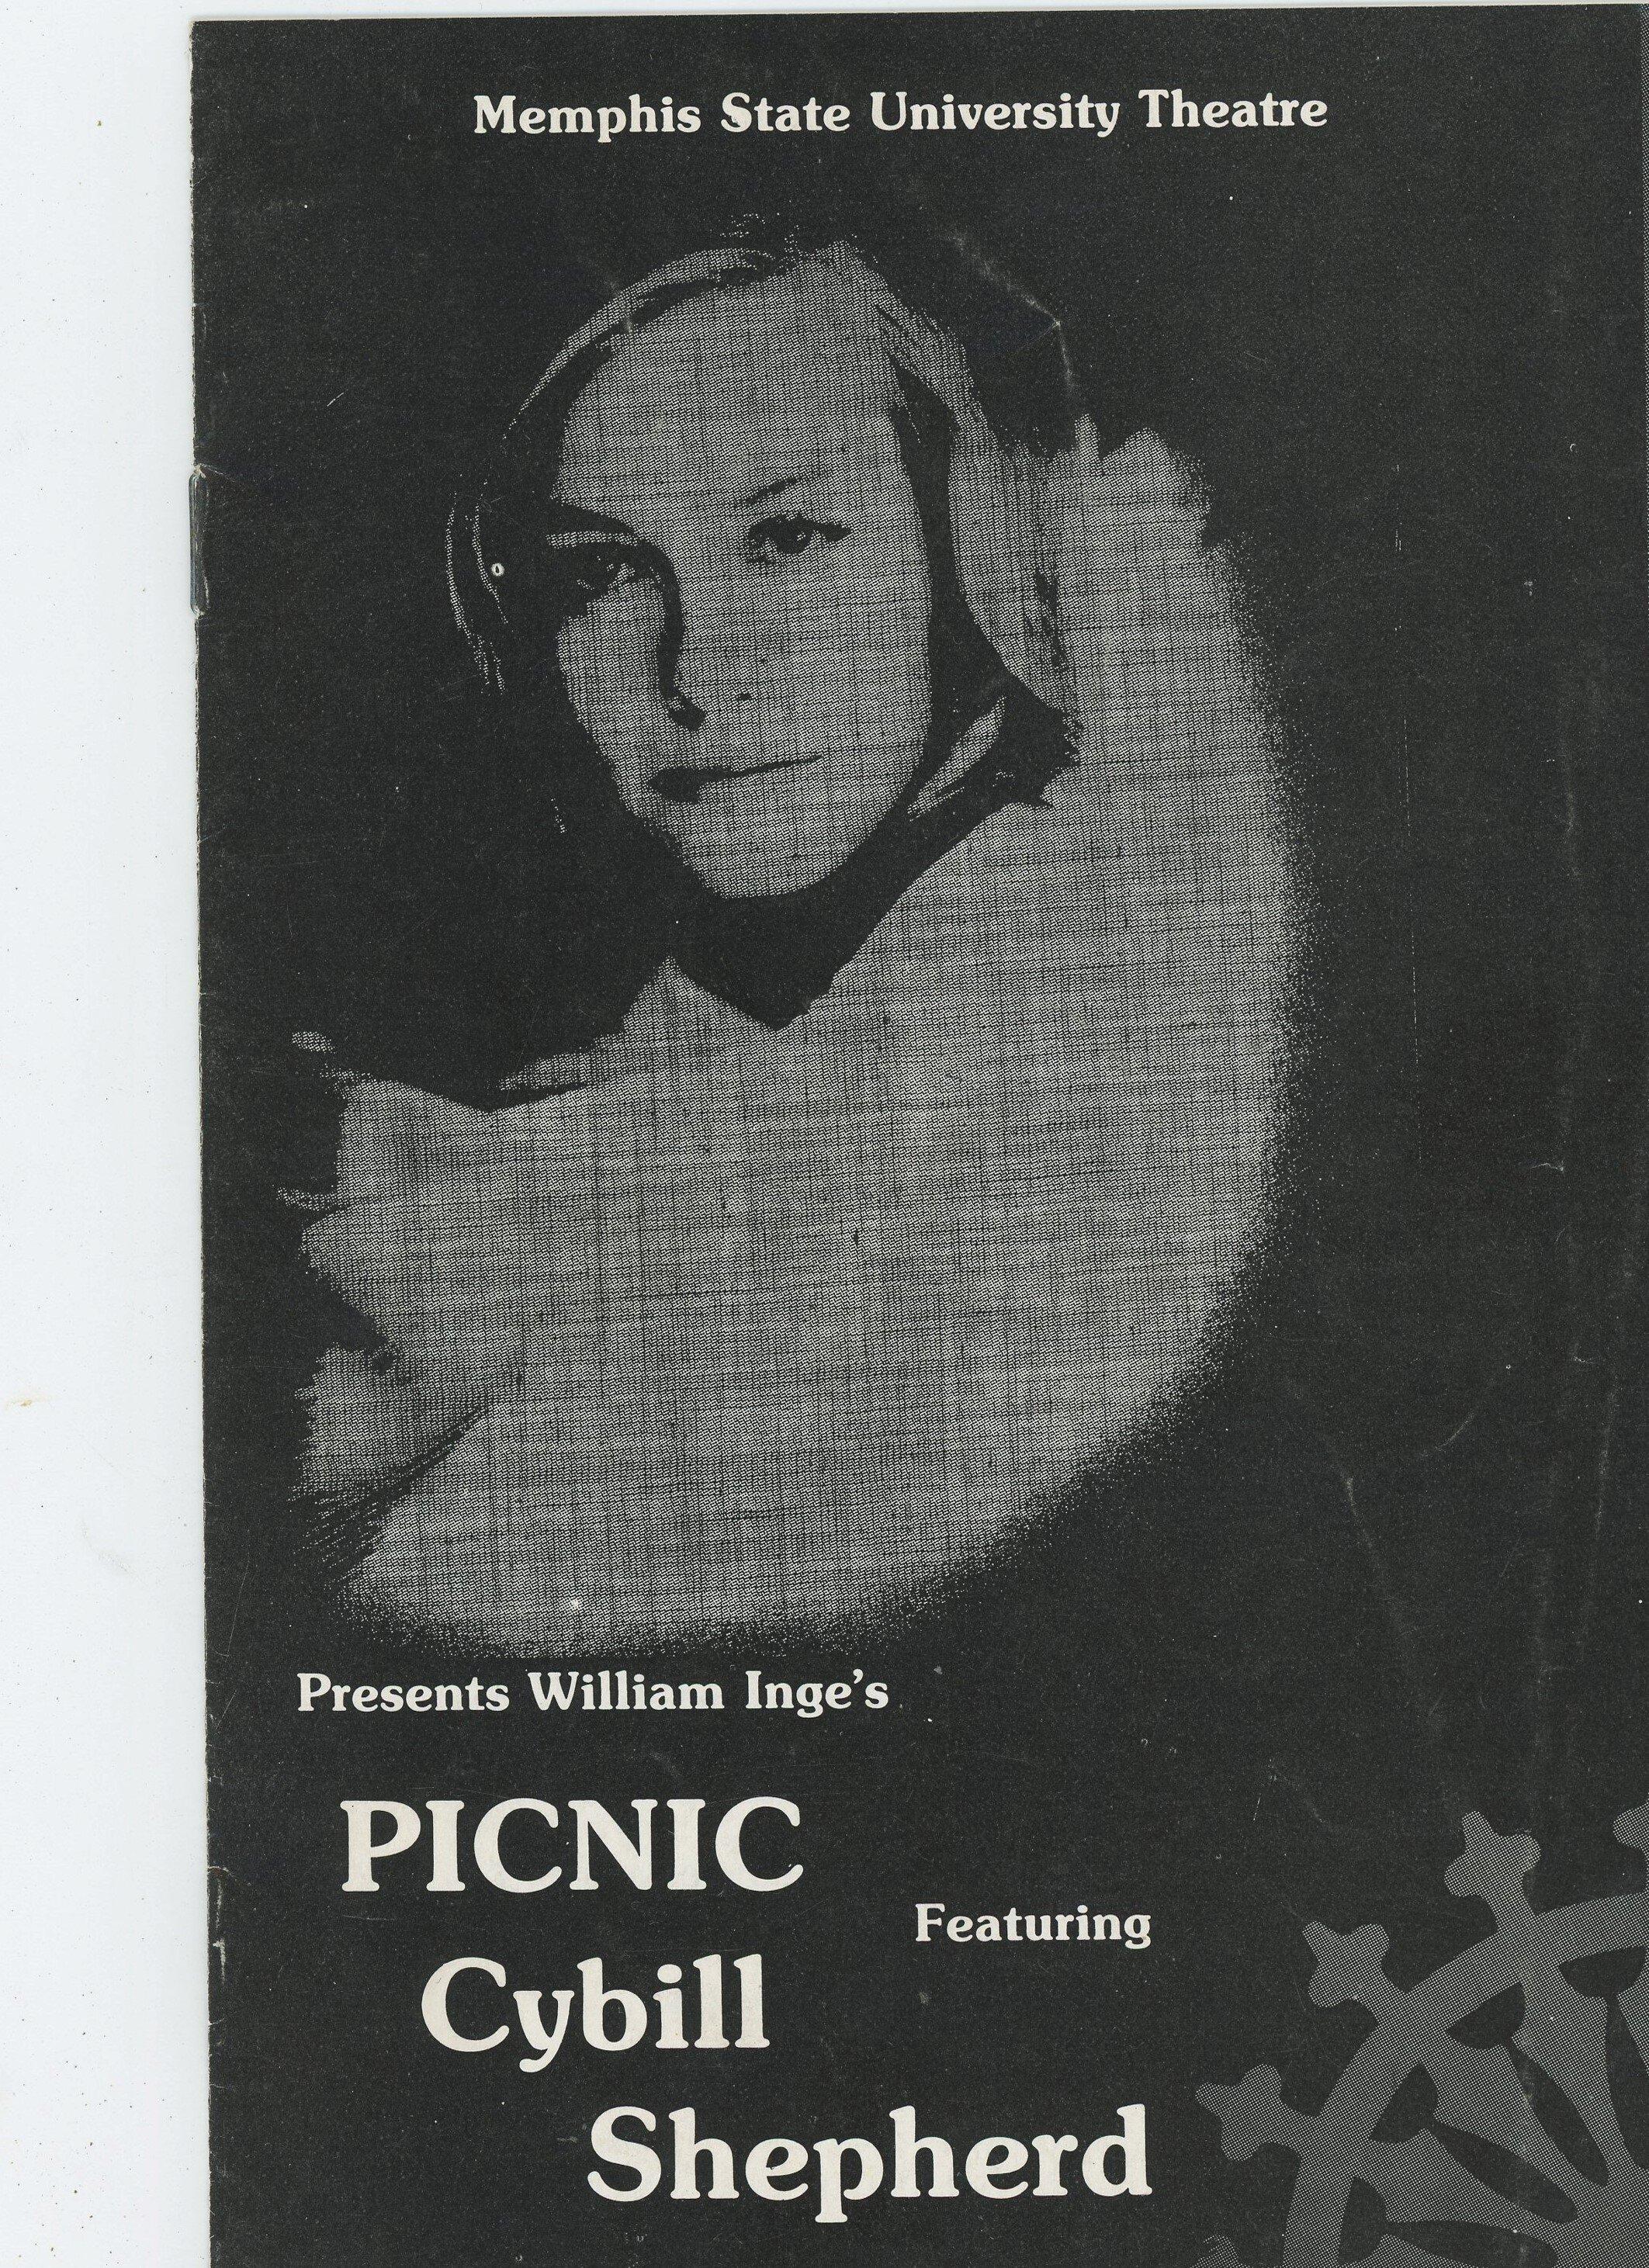 Cybill Shepherd 1980 Picnic -